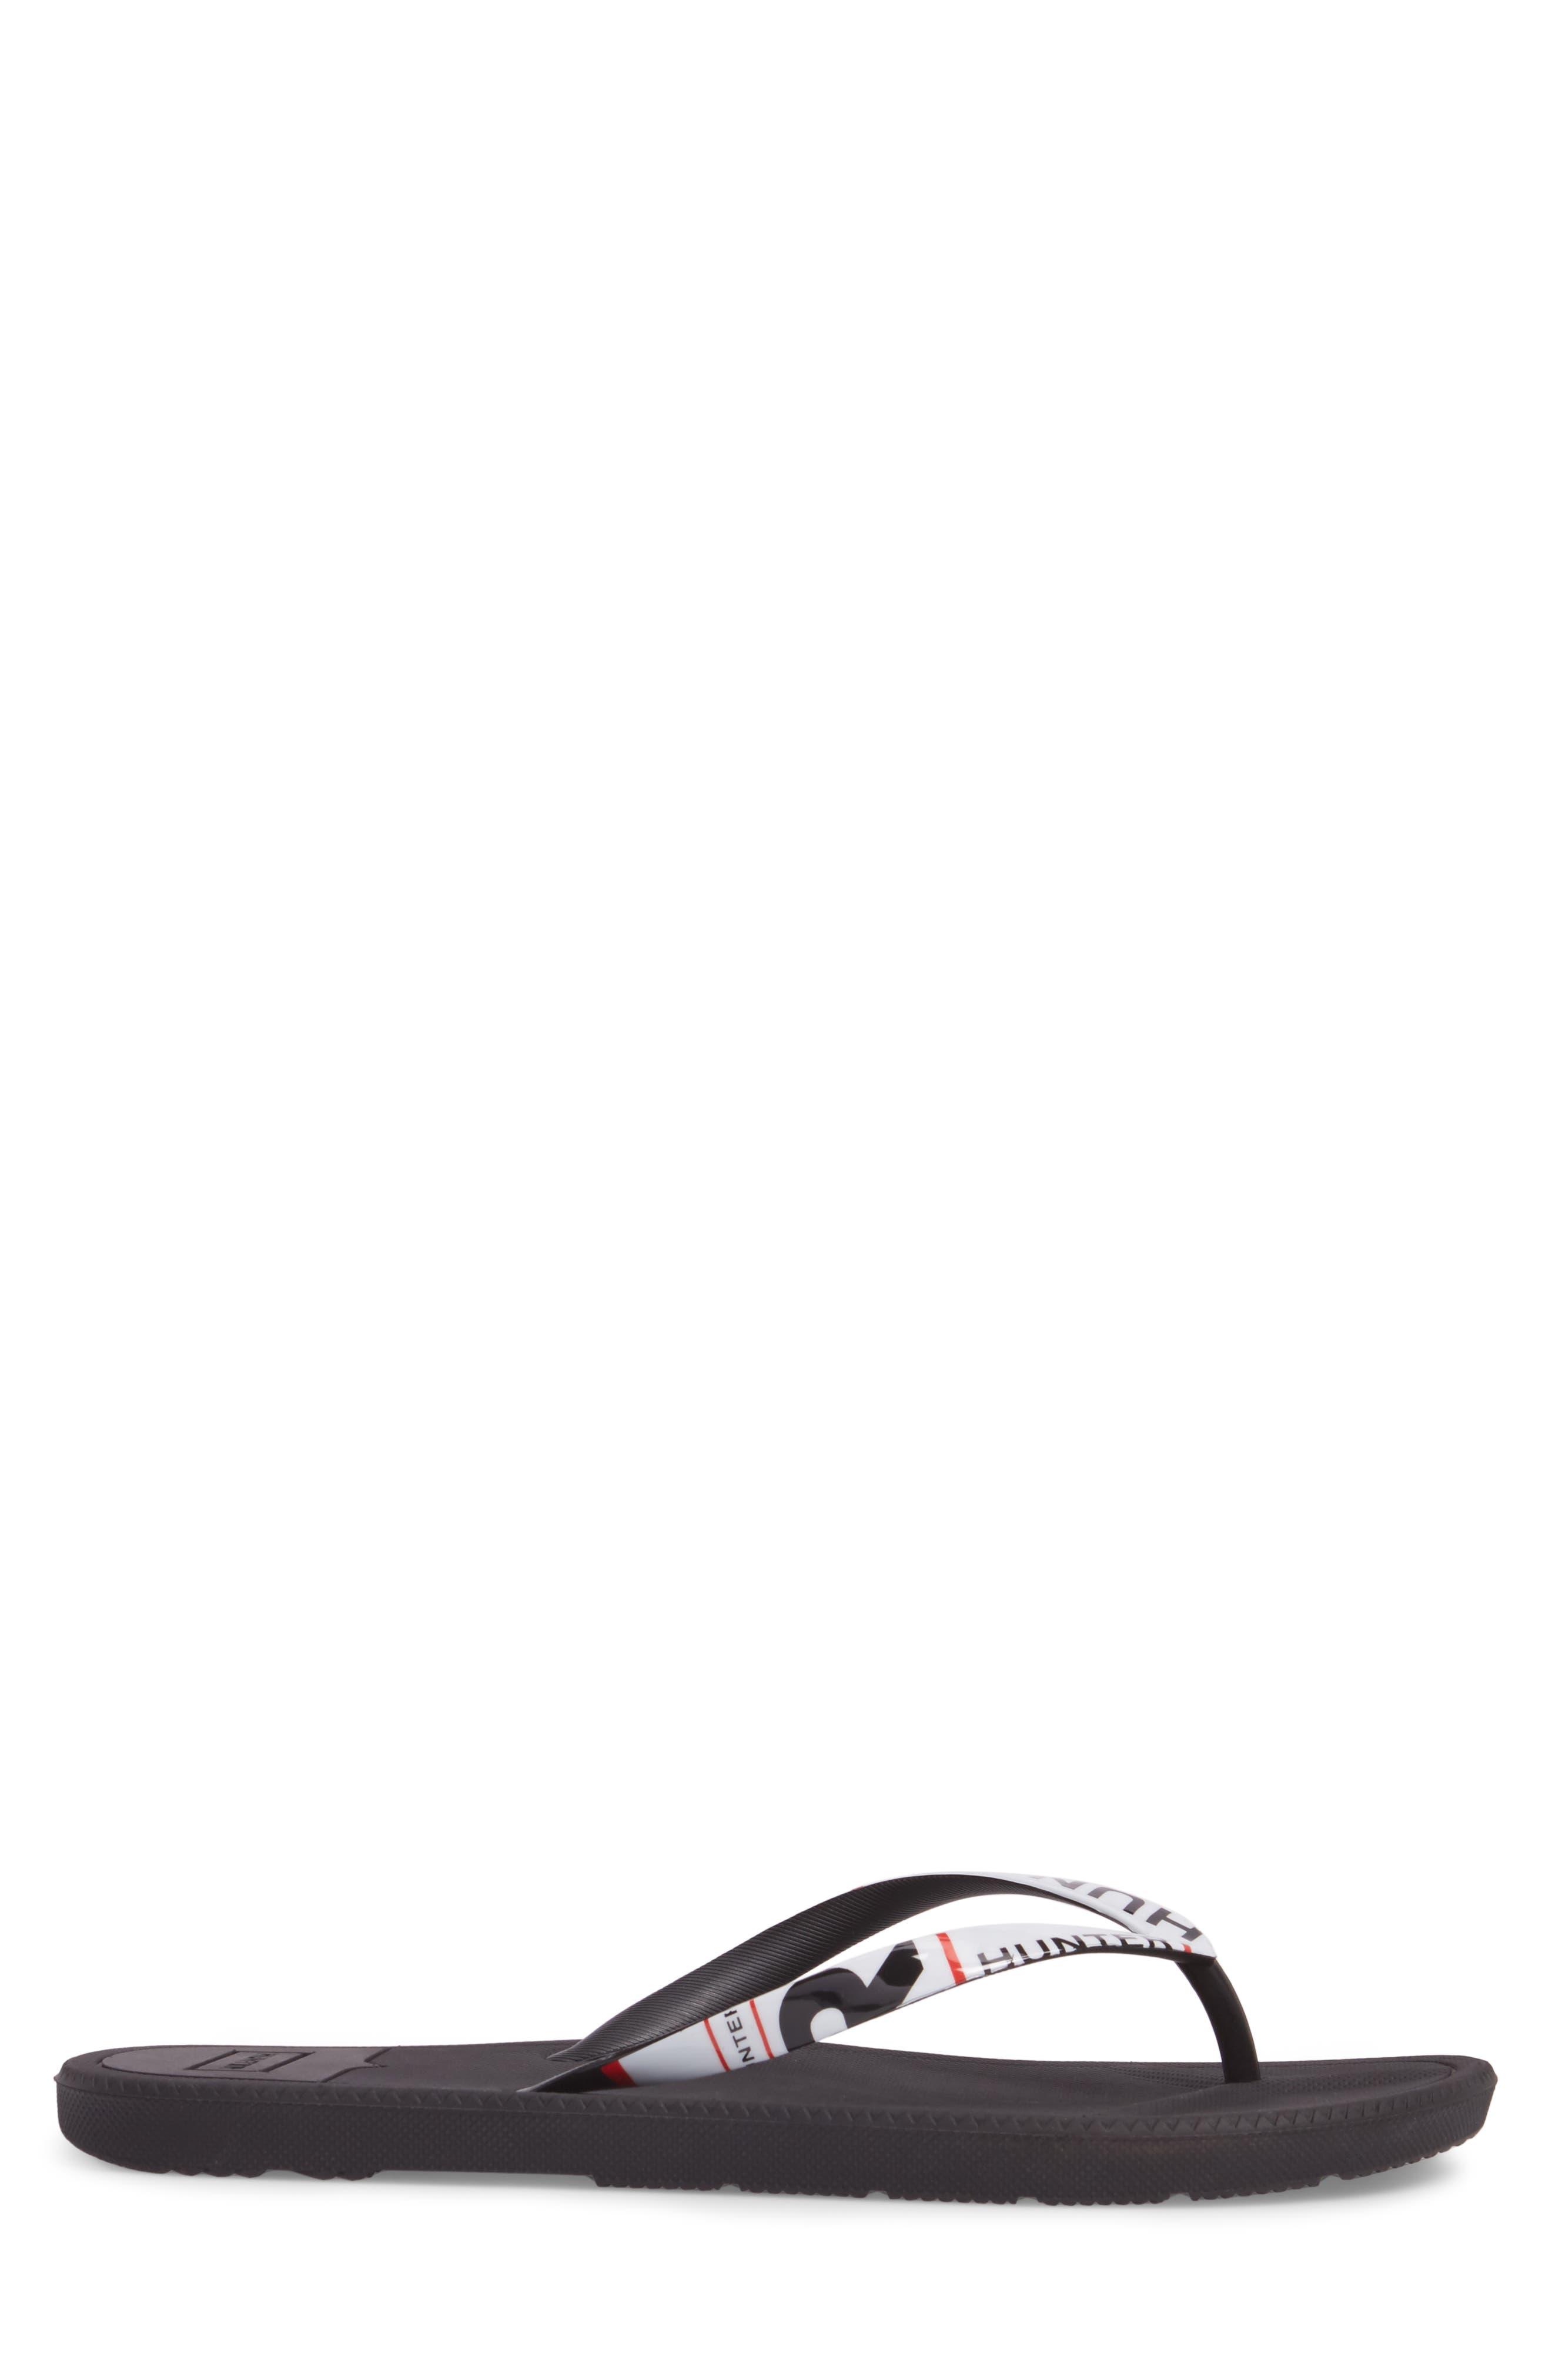 HUNTER, Original Exploded Logo Flip Flop, Alternate thumbnail 3, color, BLACK